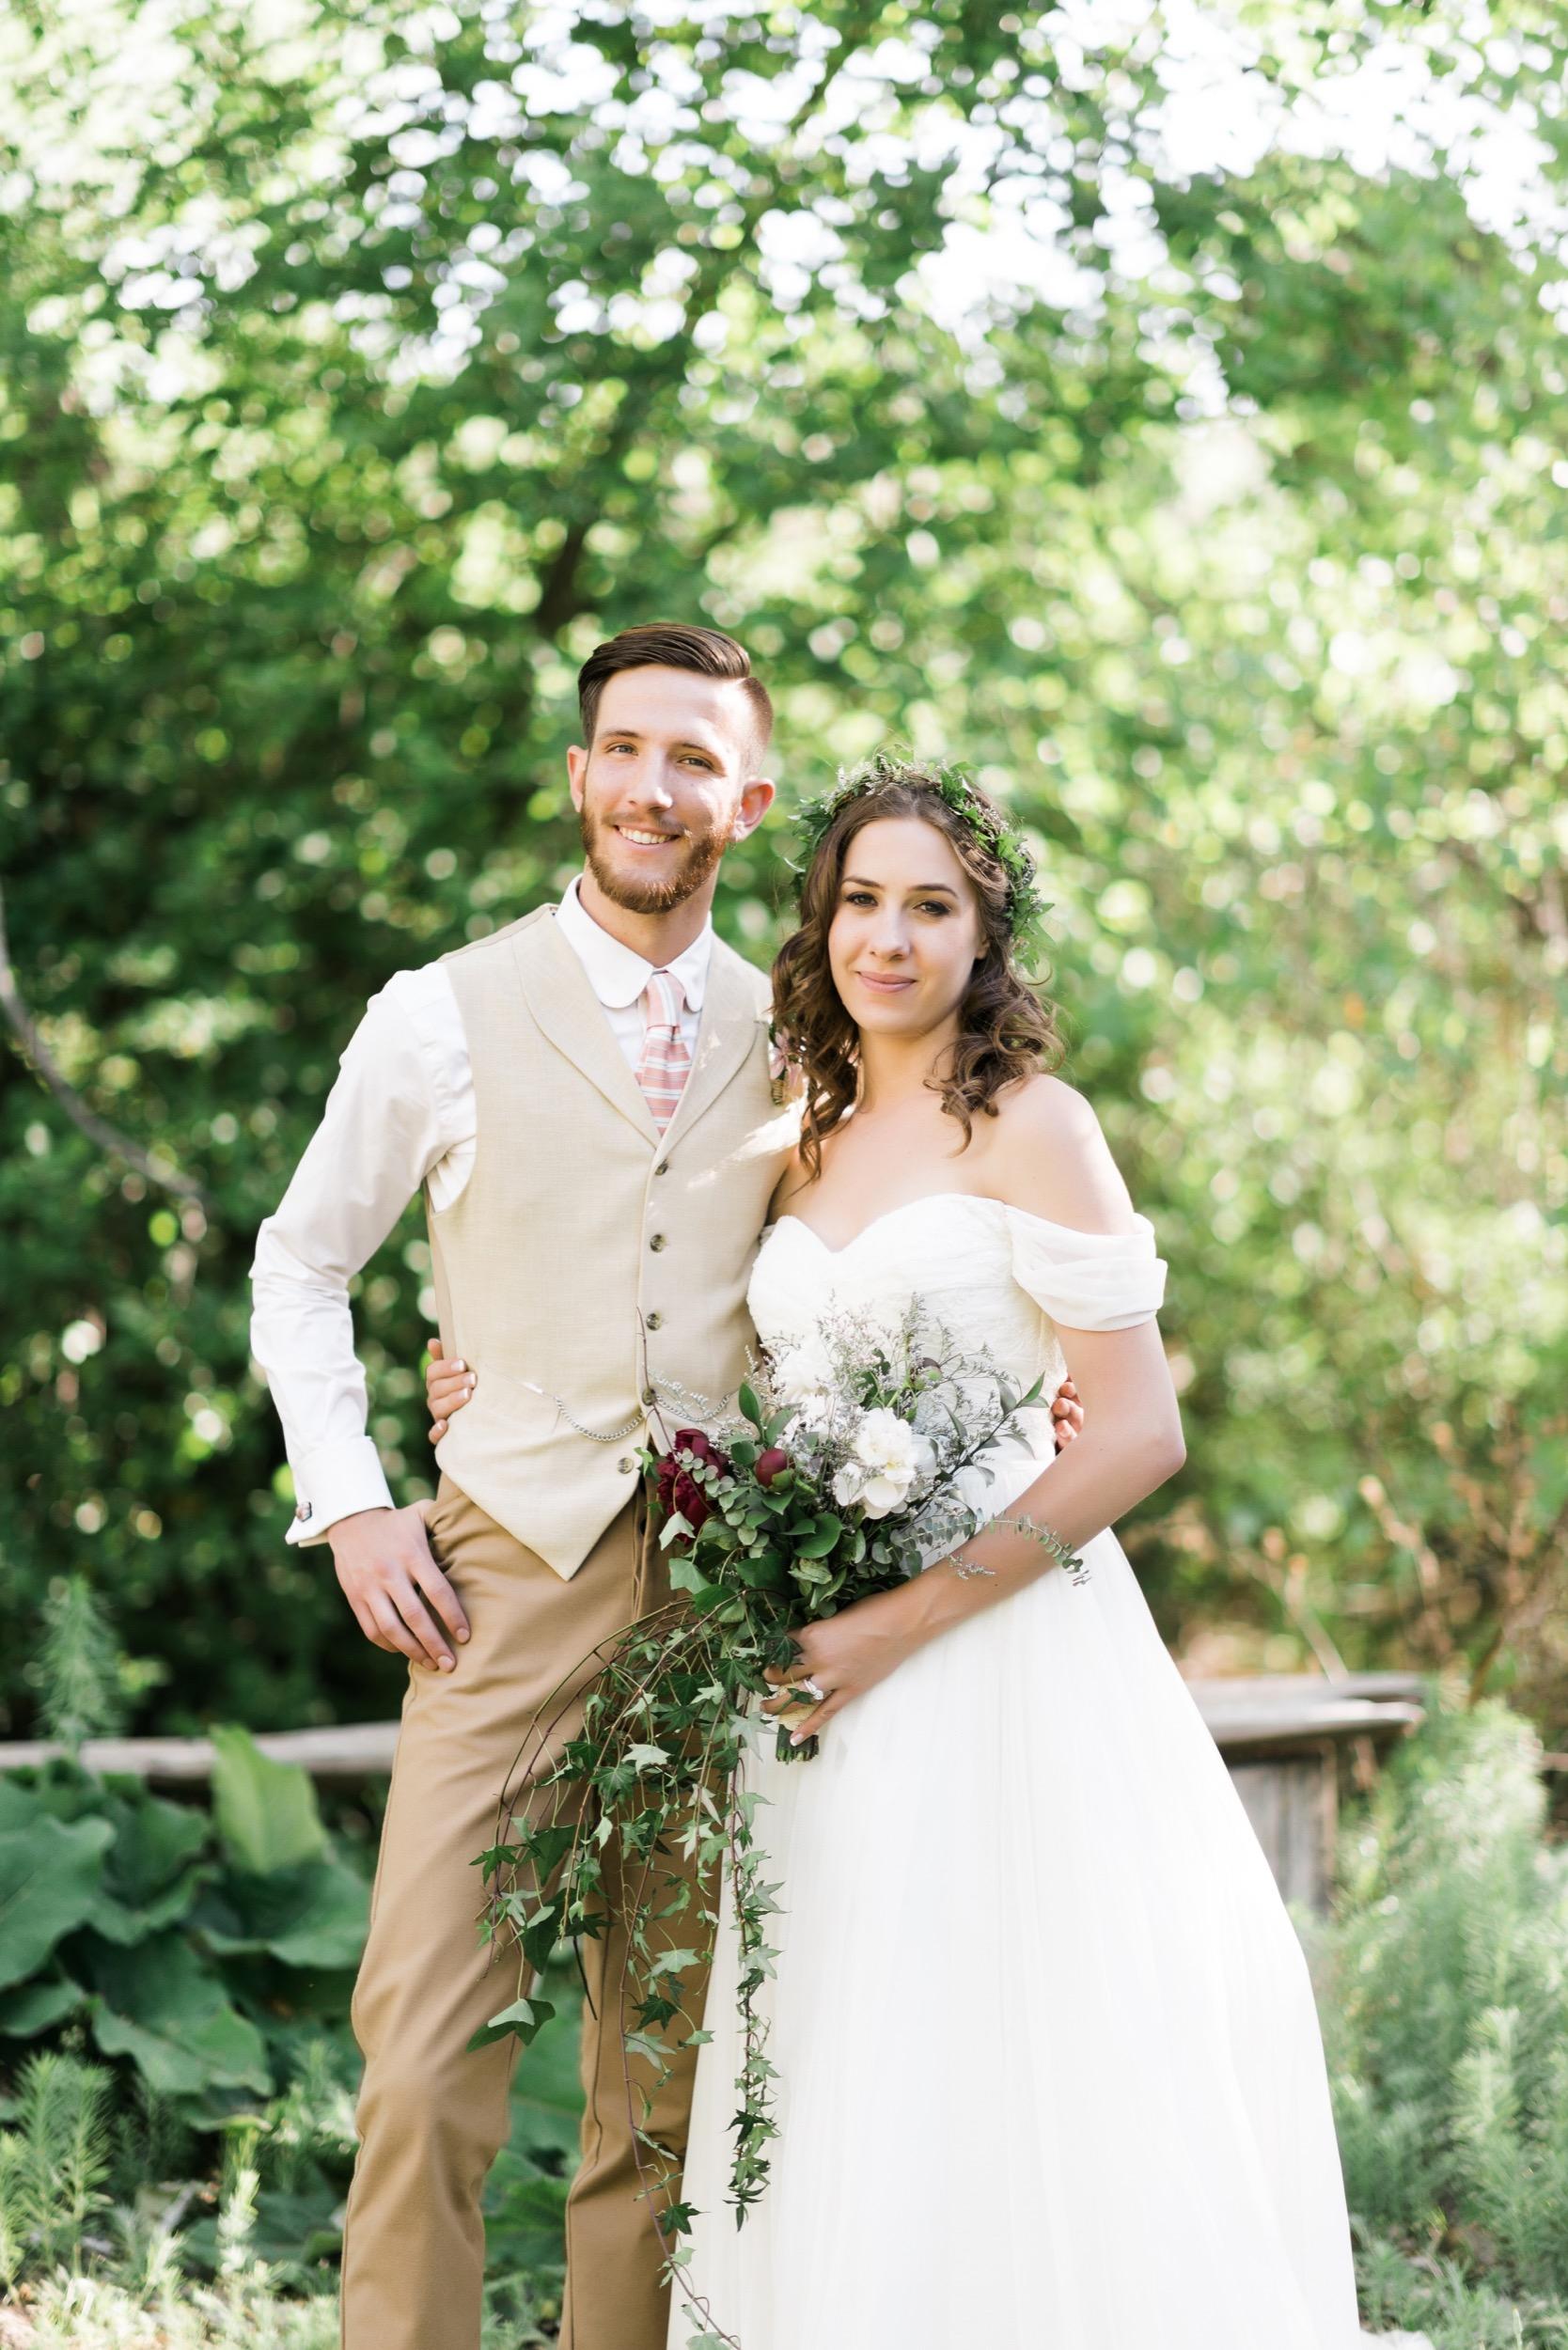 Josh&Lydia-1233.jpg